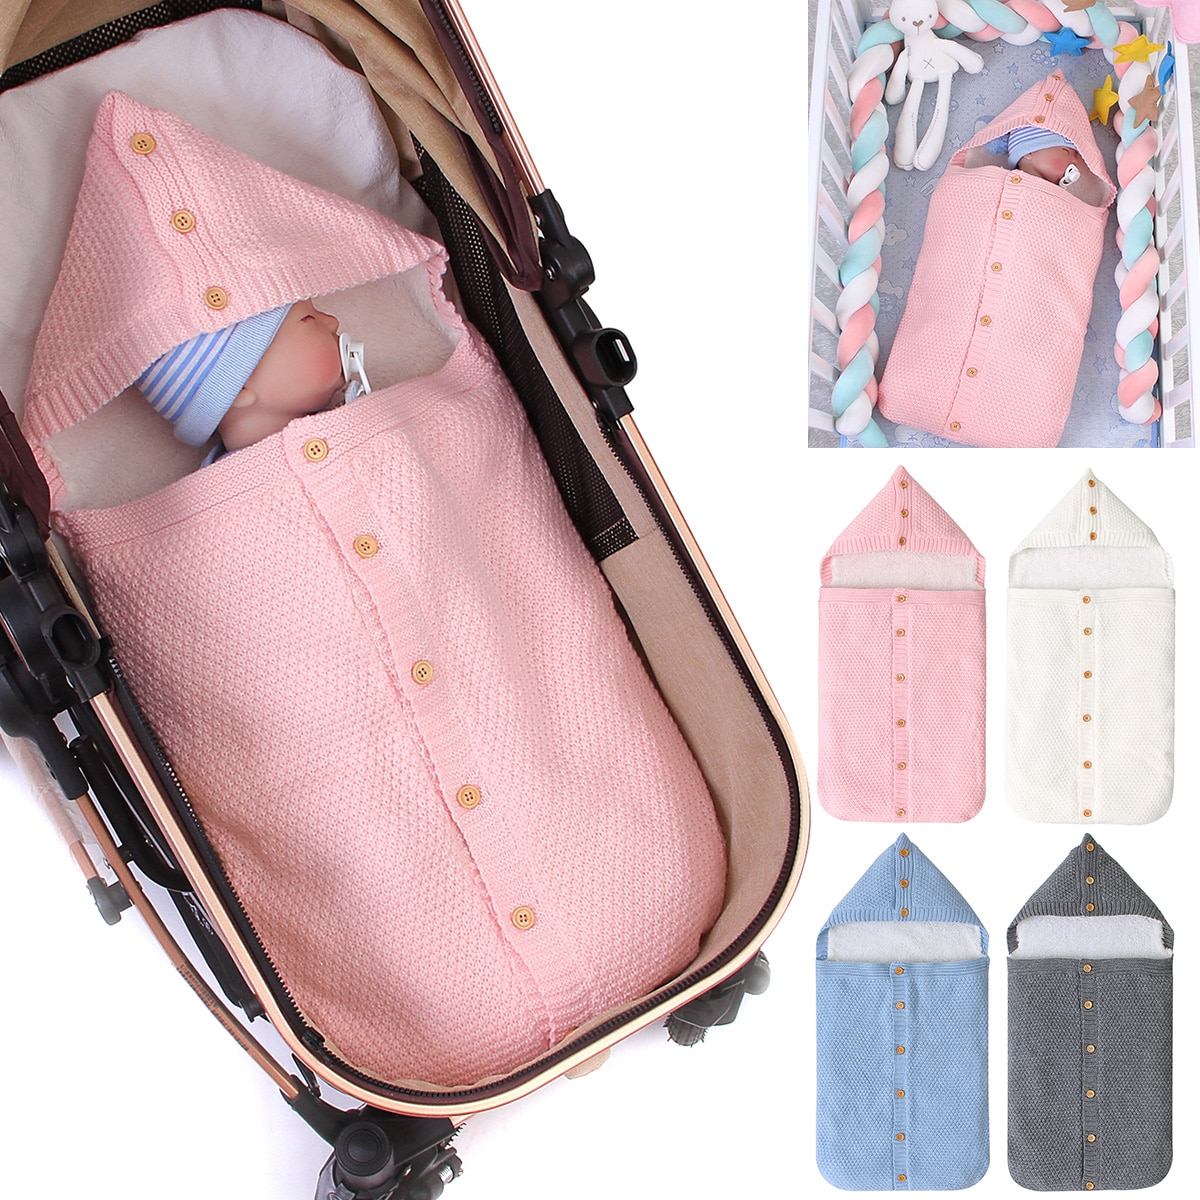 Winter Warm Newborn Baby Sleeping Bags Infant Button Knit Swaddle Wrap Swaddling Stroller Wrap Toddler Blanket Sleeping Bags